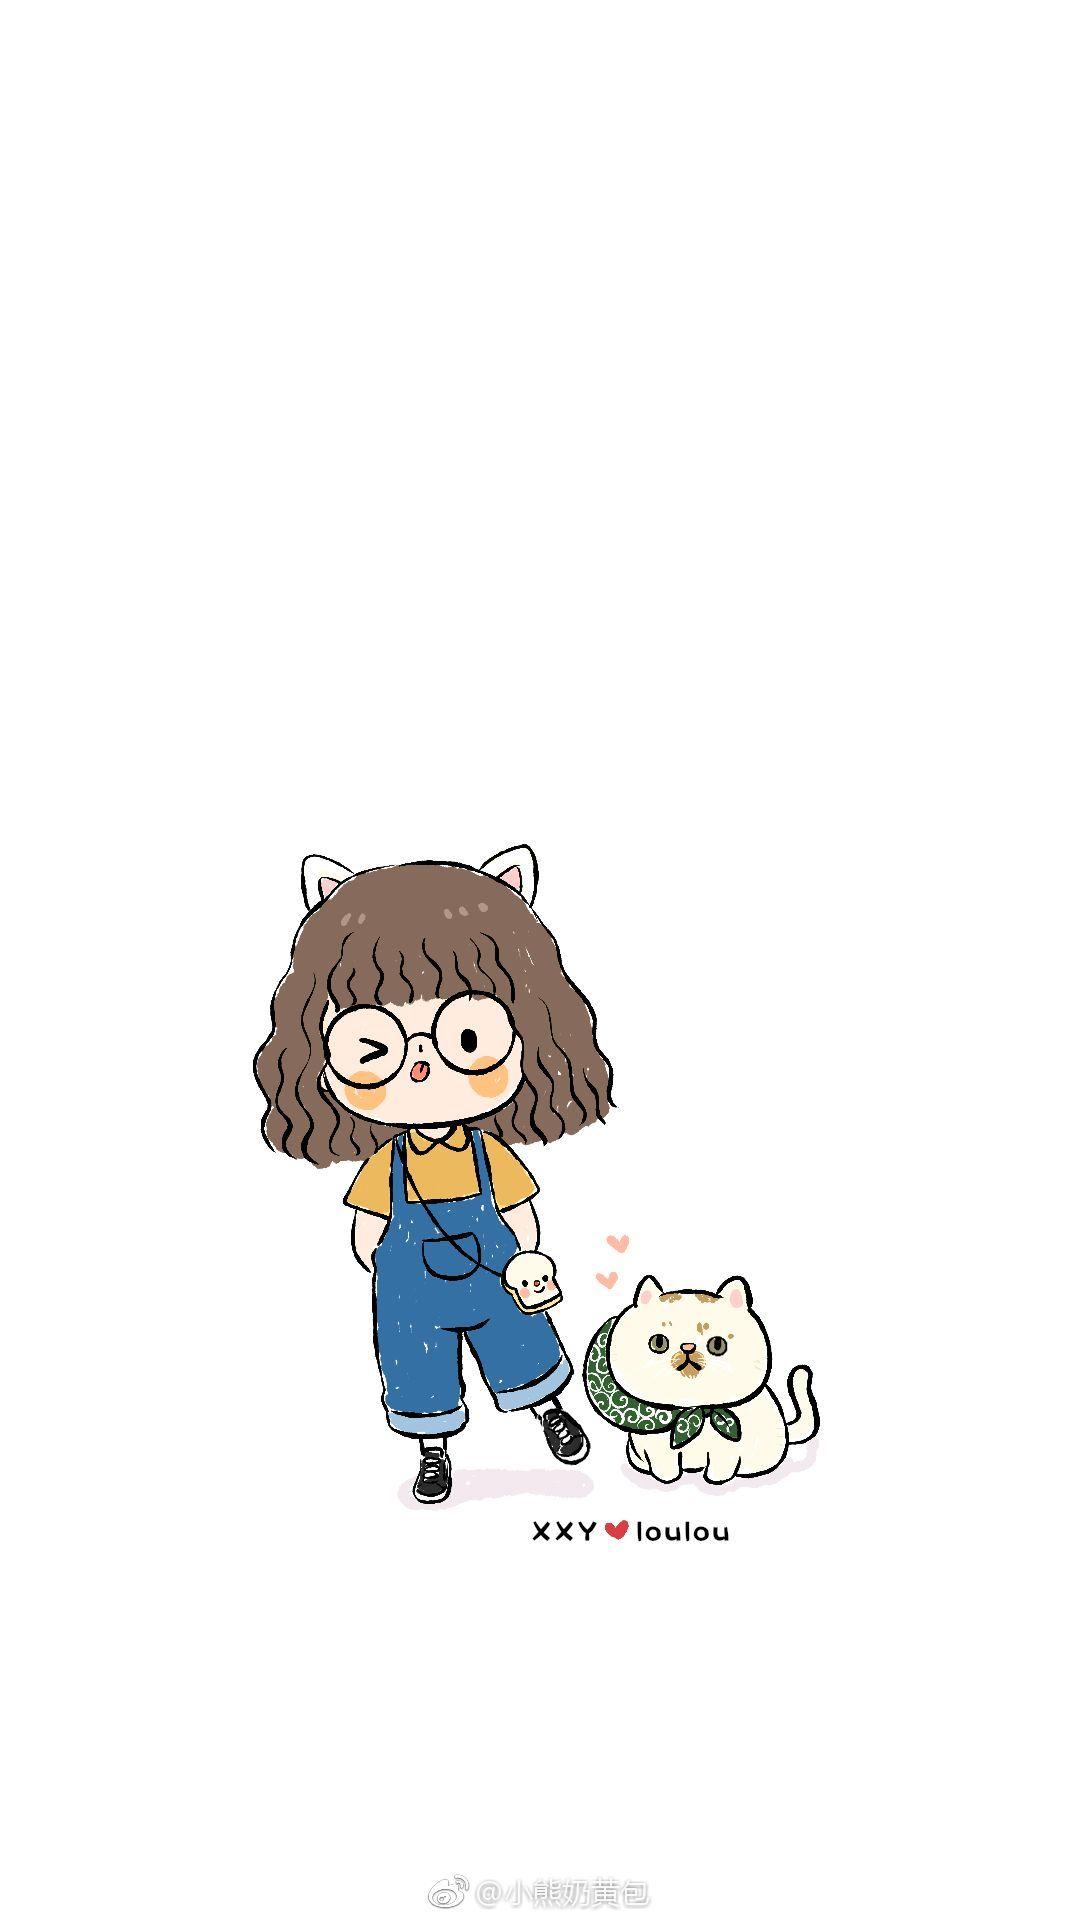 illustrator character